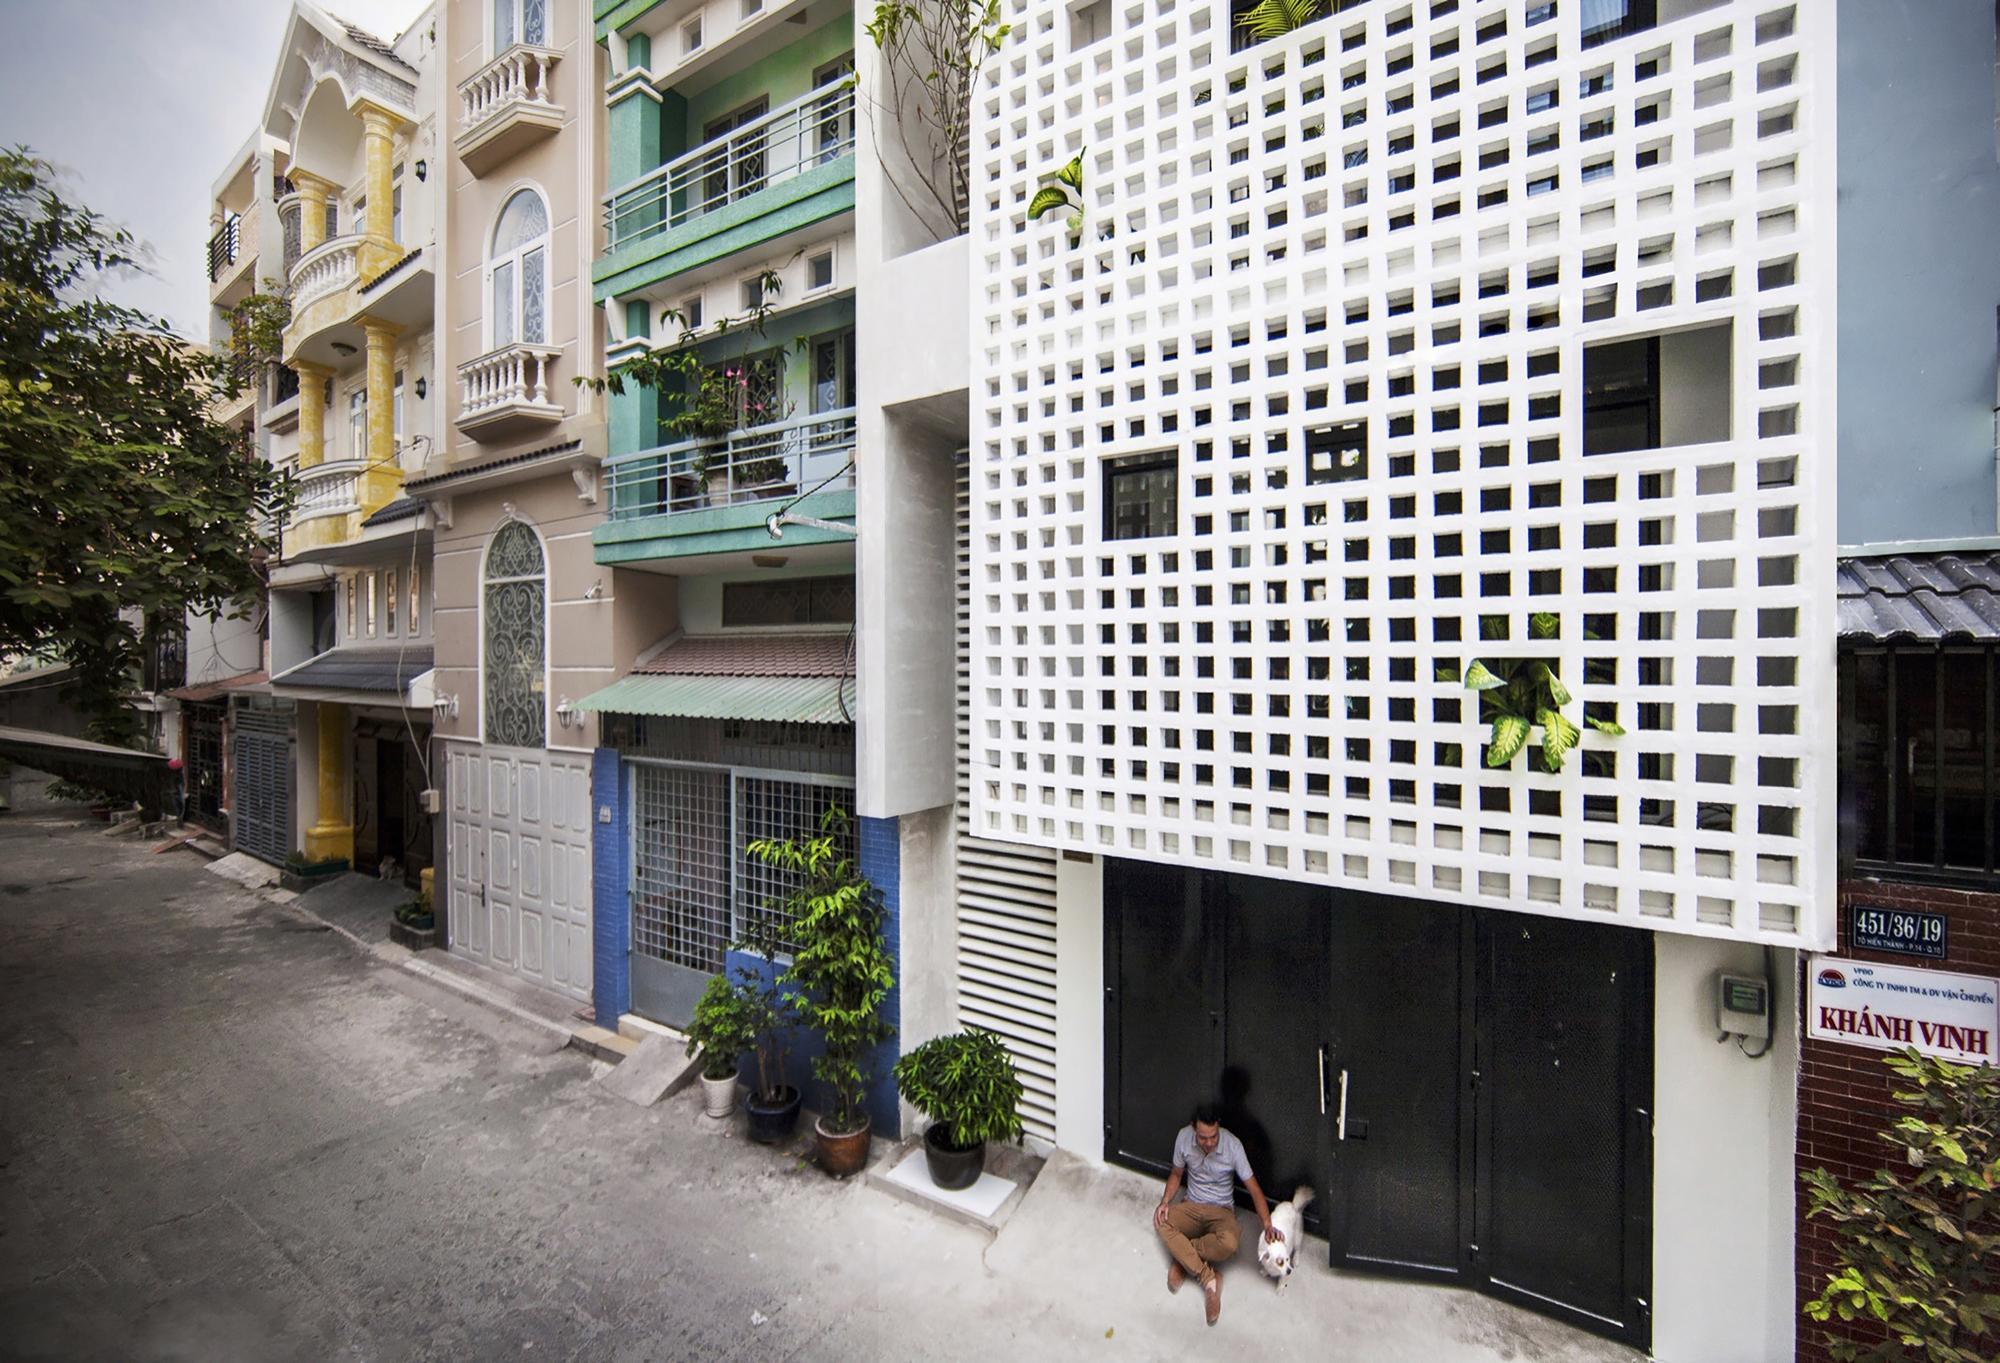 Q10 House  Studio8 Vietnam  ArchDaily